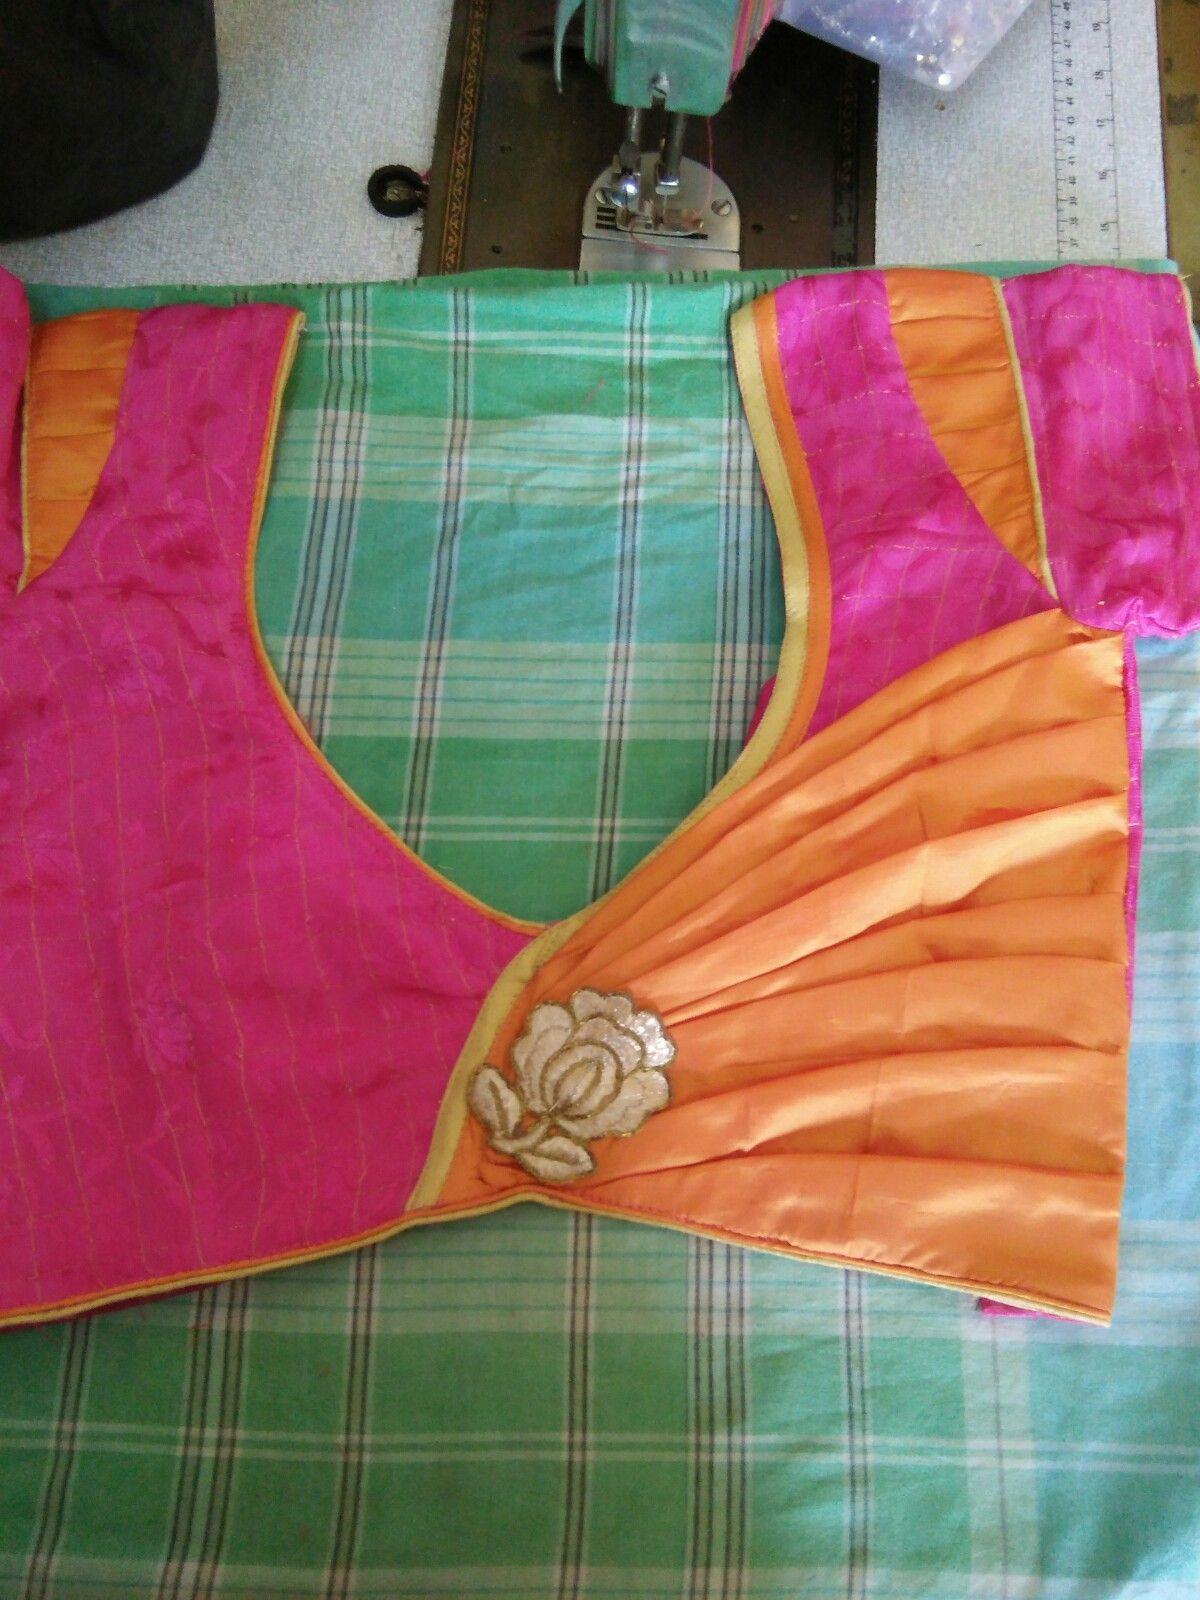 Blouse patterns blouse patterns pinterest blouse